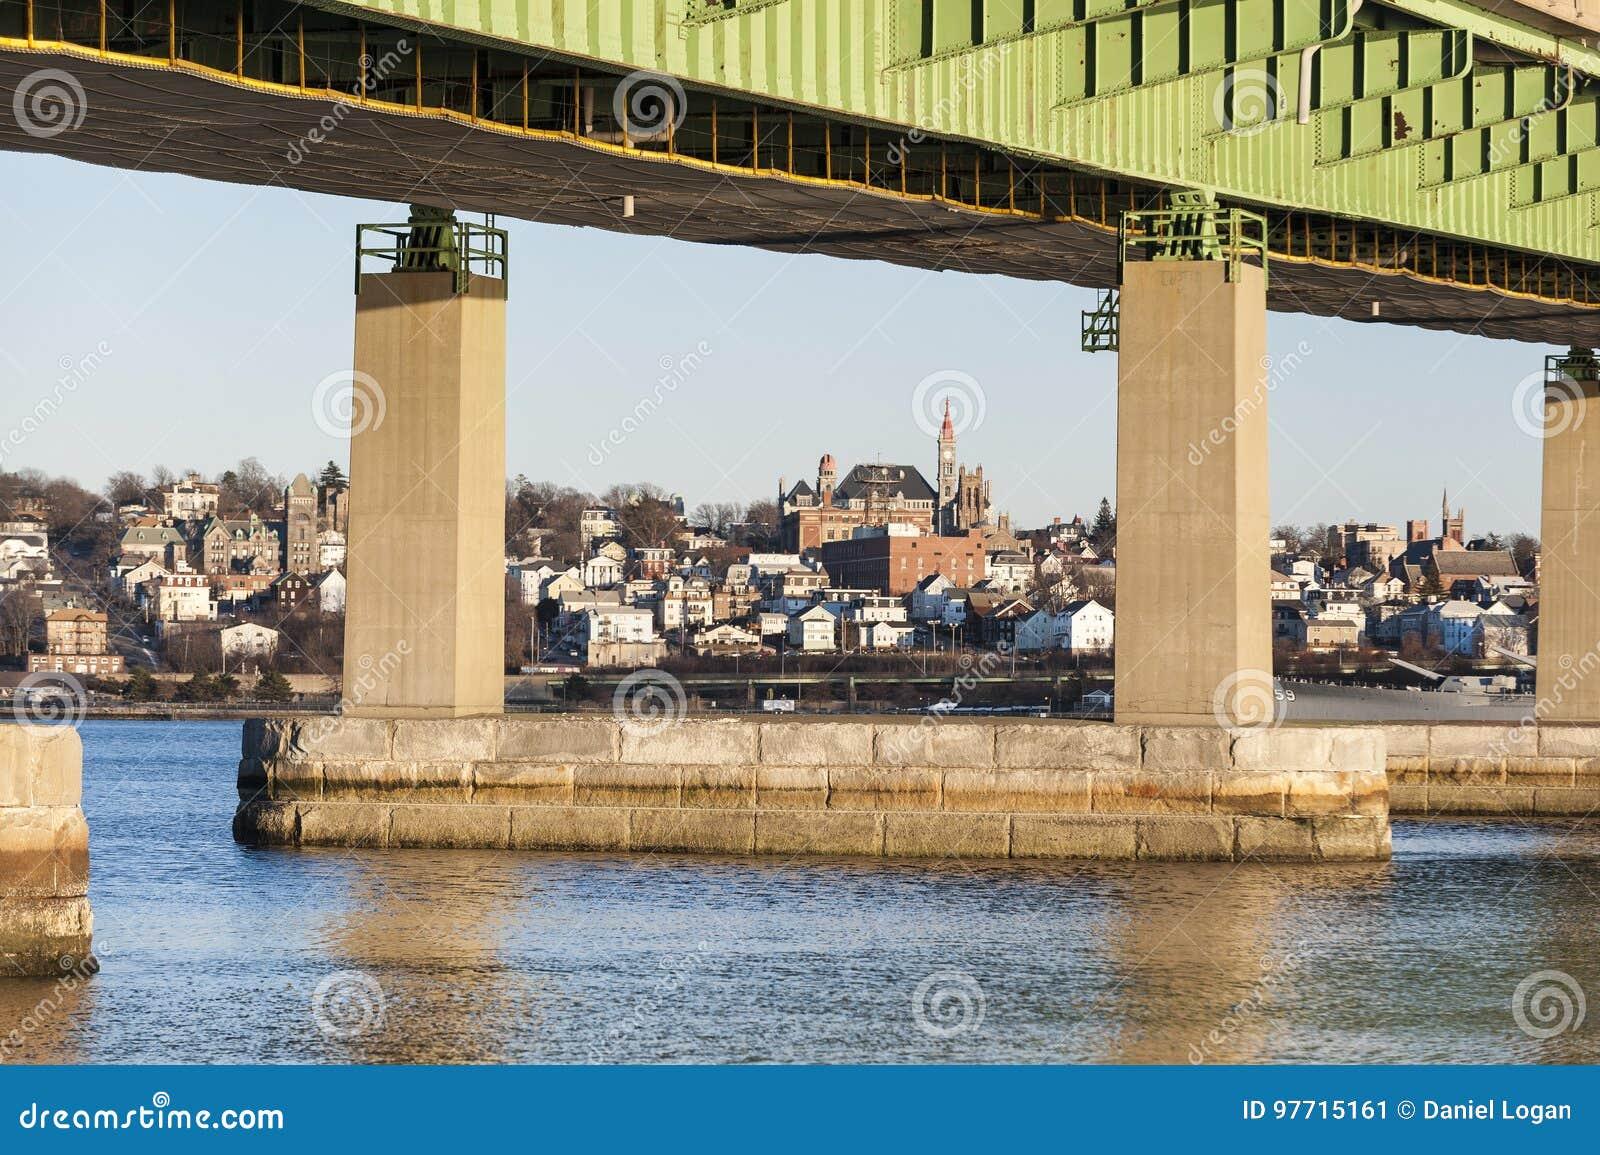 Braga Bridge Framing Fall River Skyline Stock Image - Image of urban ...